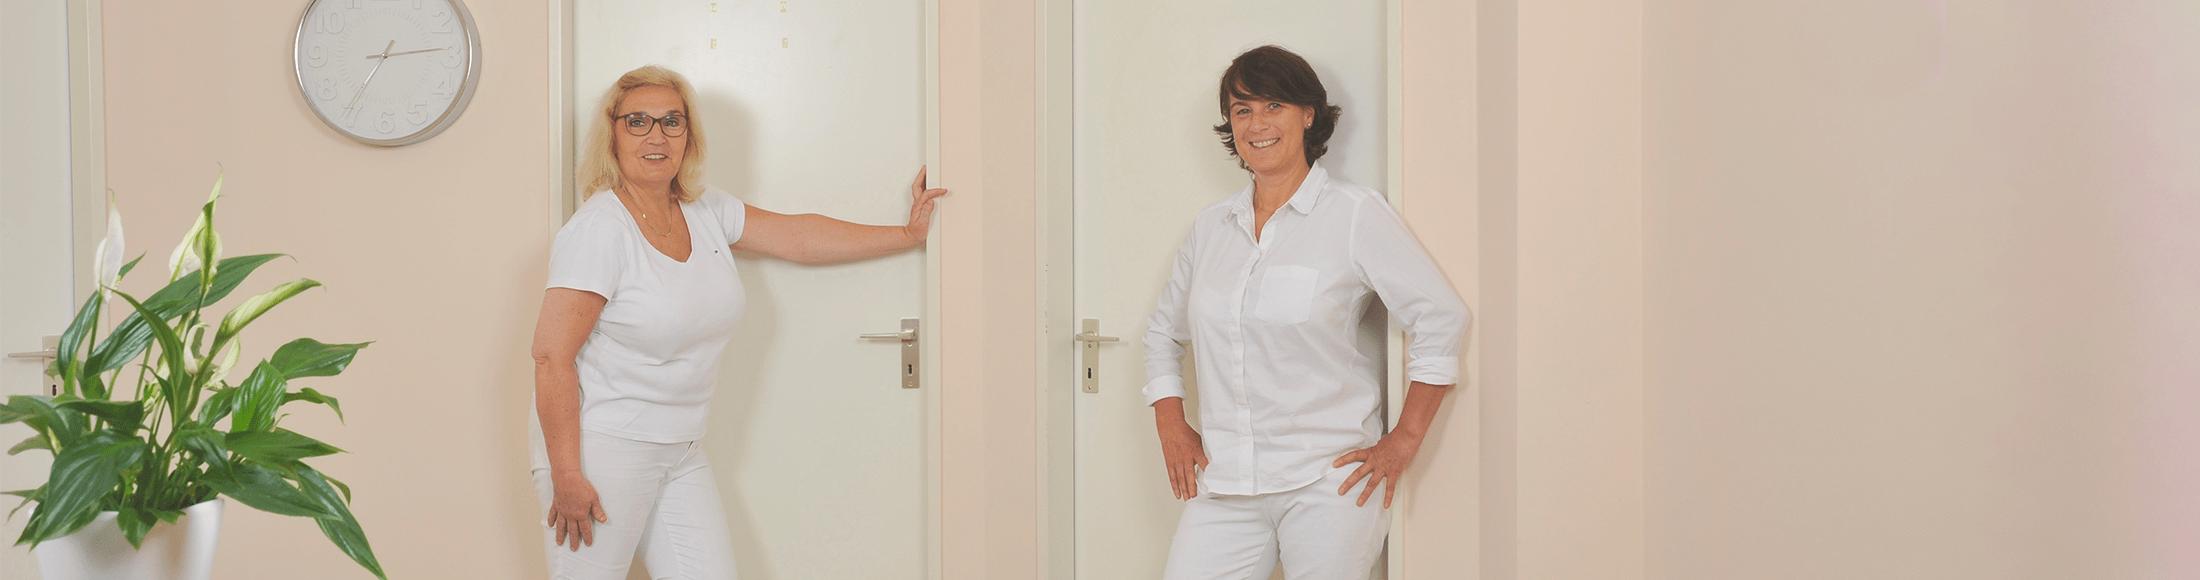 Antje Bolli-Trostdorf und Dr. Andrea Heinenberg